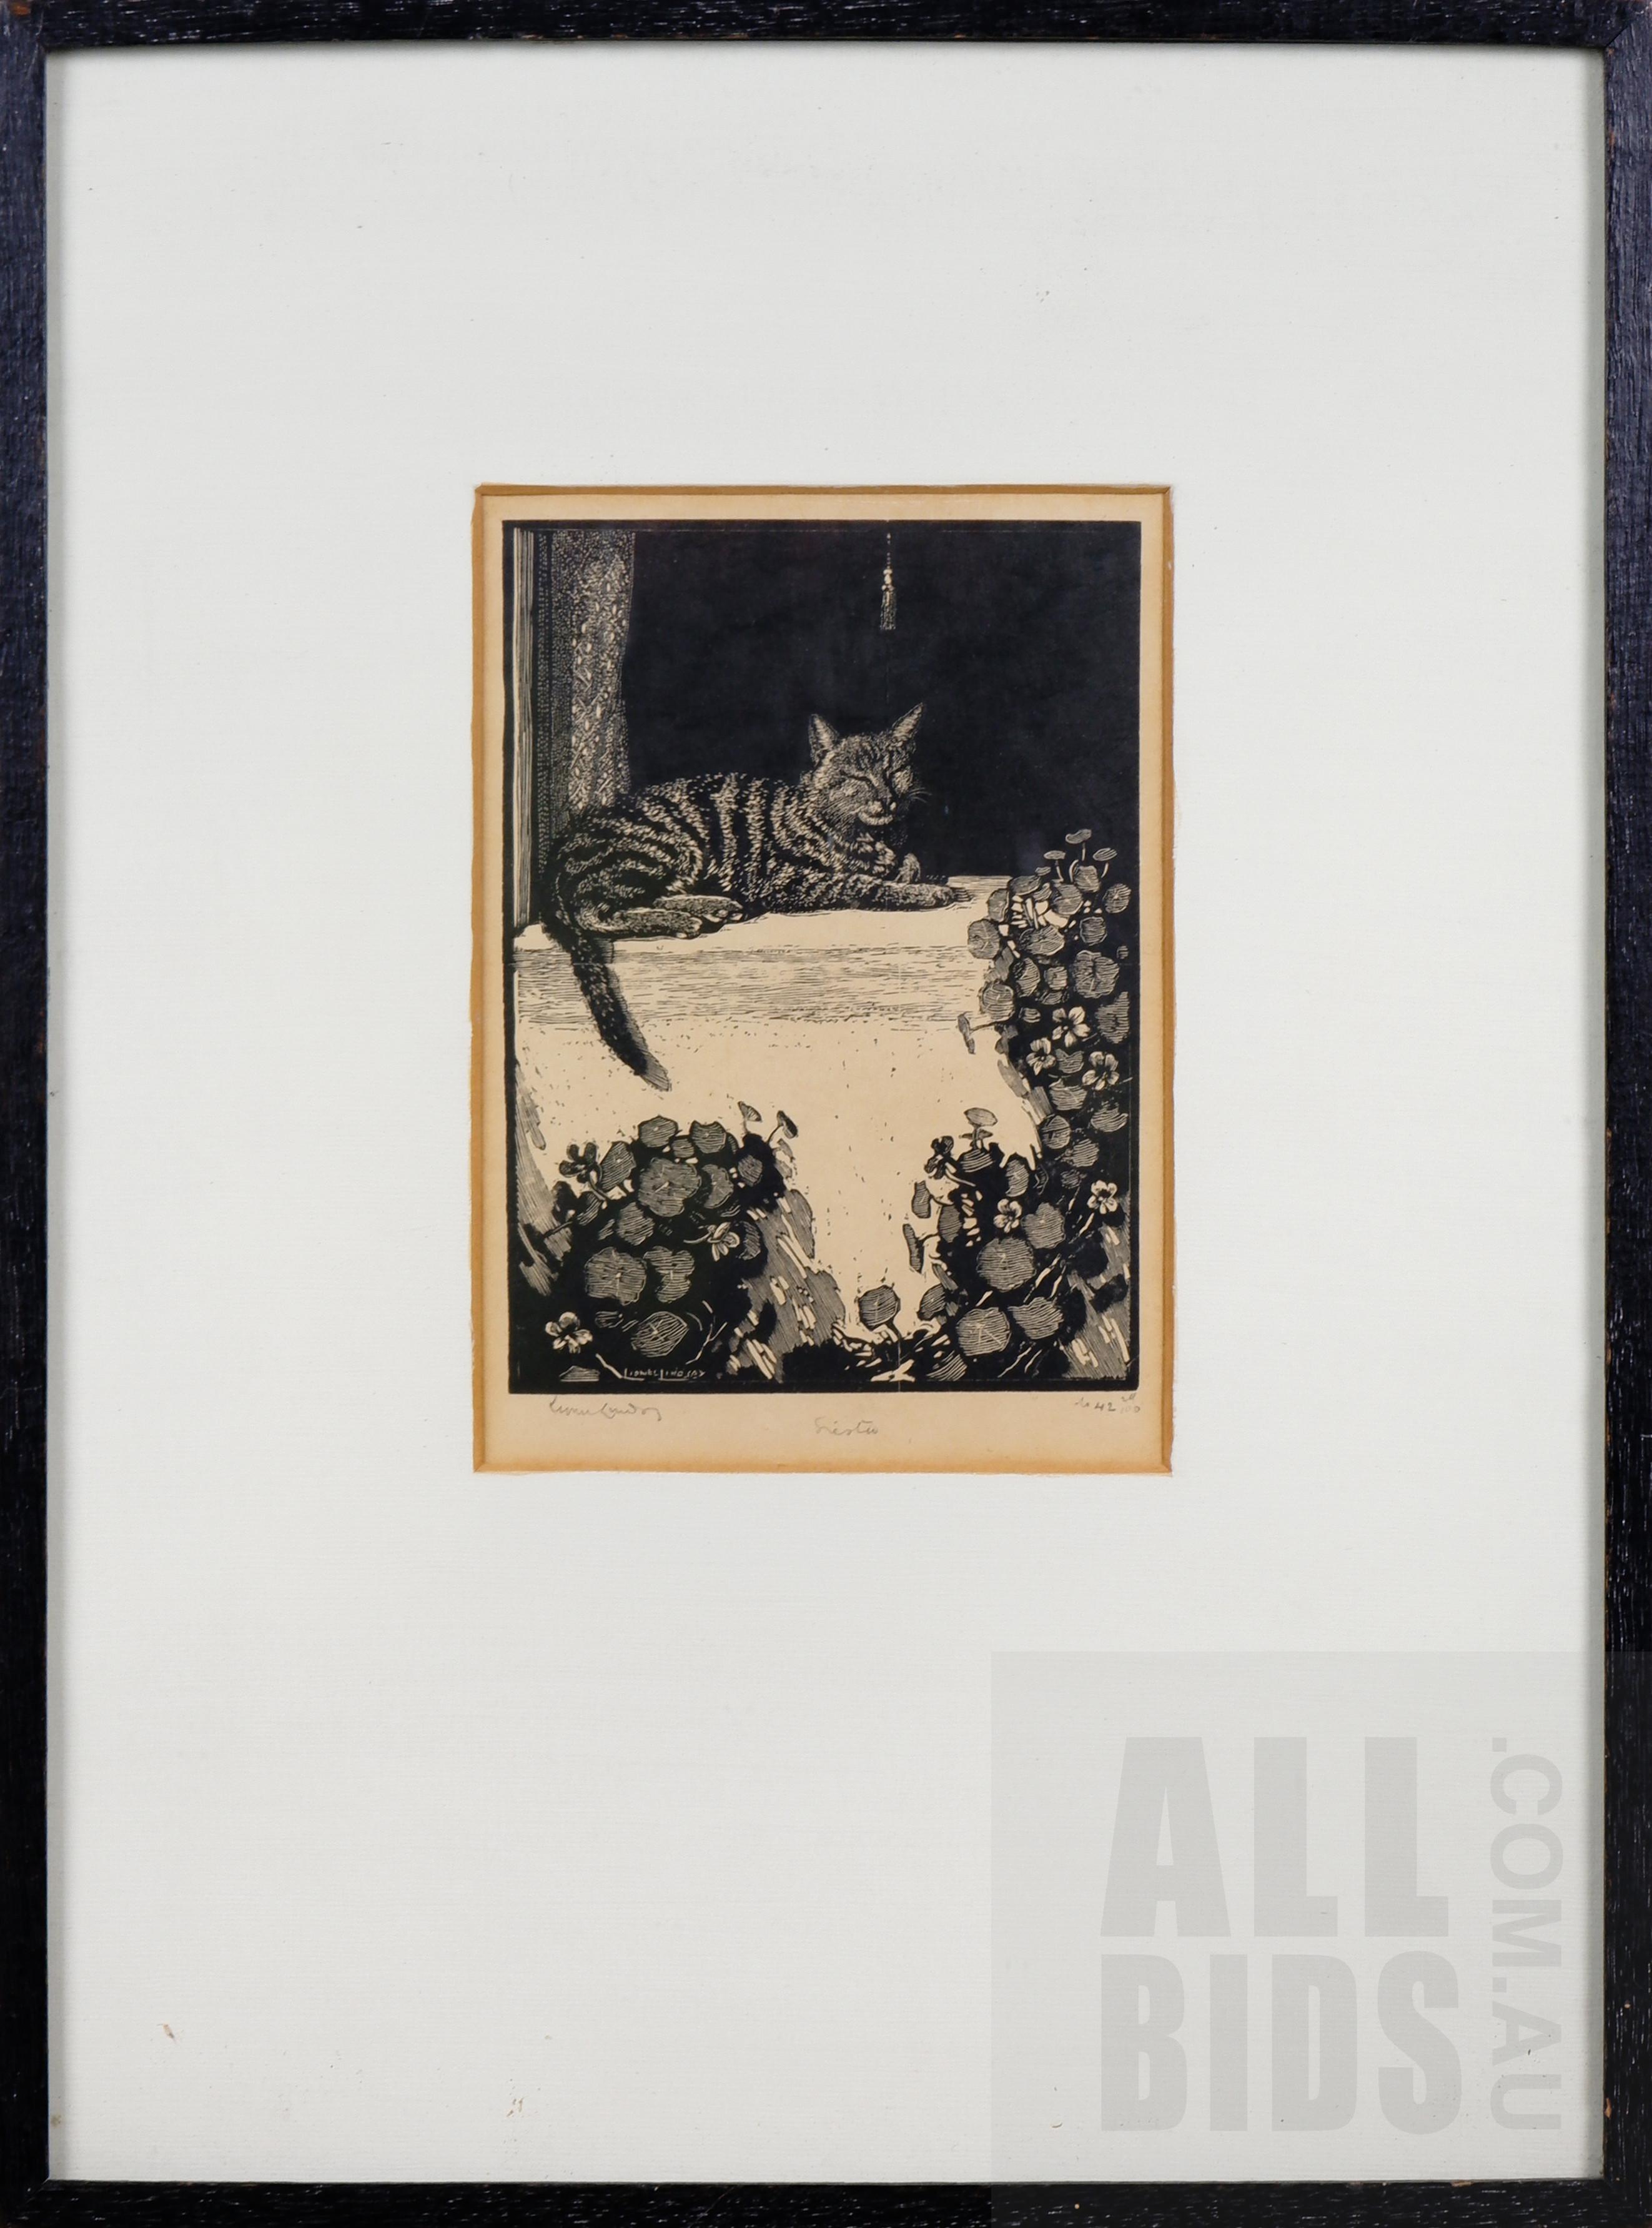 'Lionel Lindsay (1874-1961), Siesta, Woodcut, 14 x 10 cm (image size)'